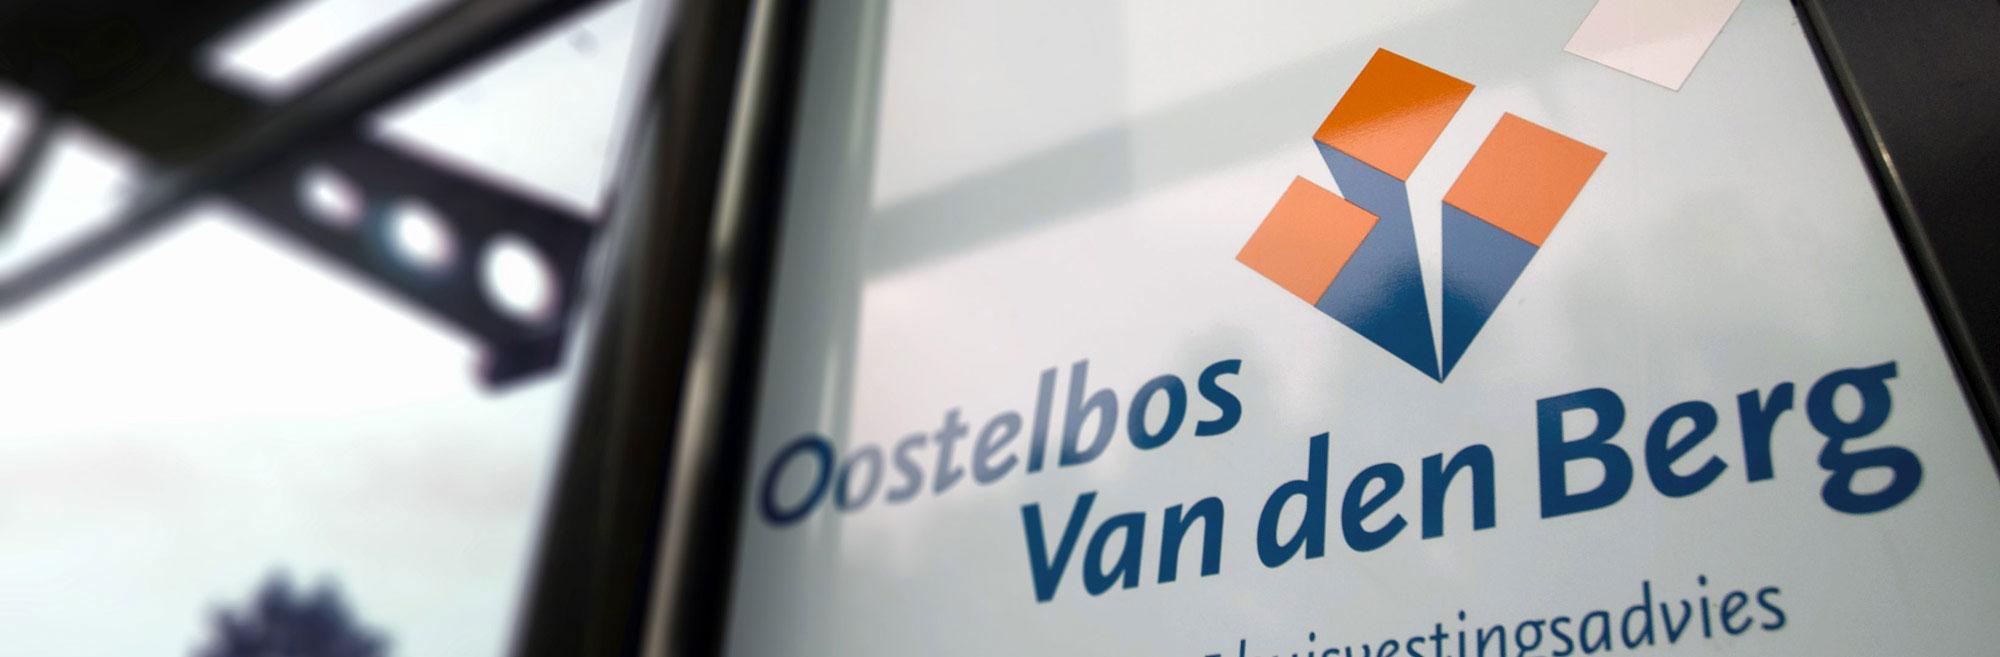 bouwadviesbureau-oostelbos-van-den-berg